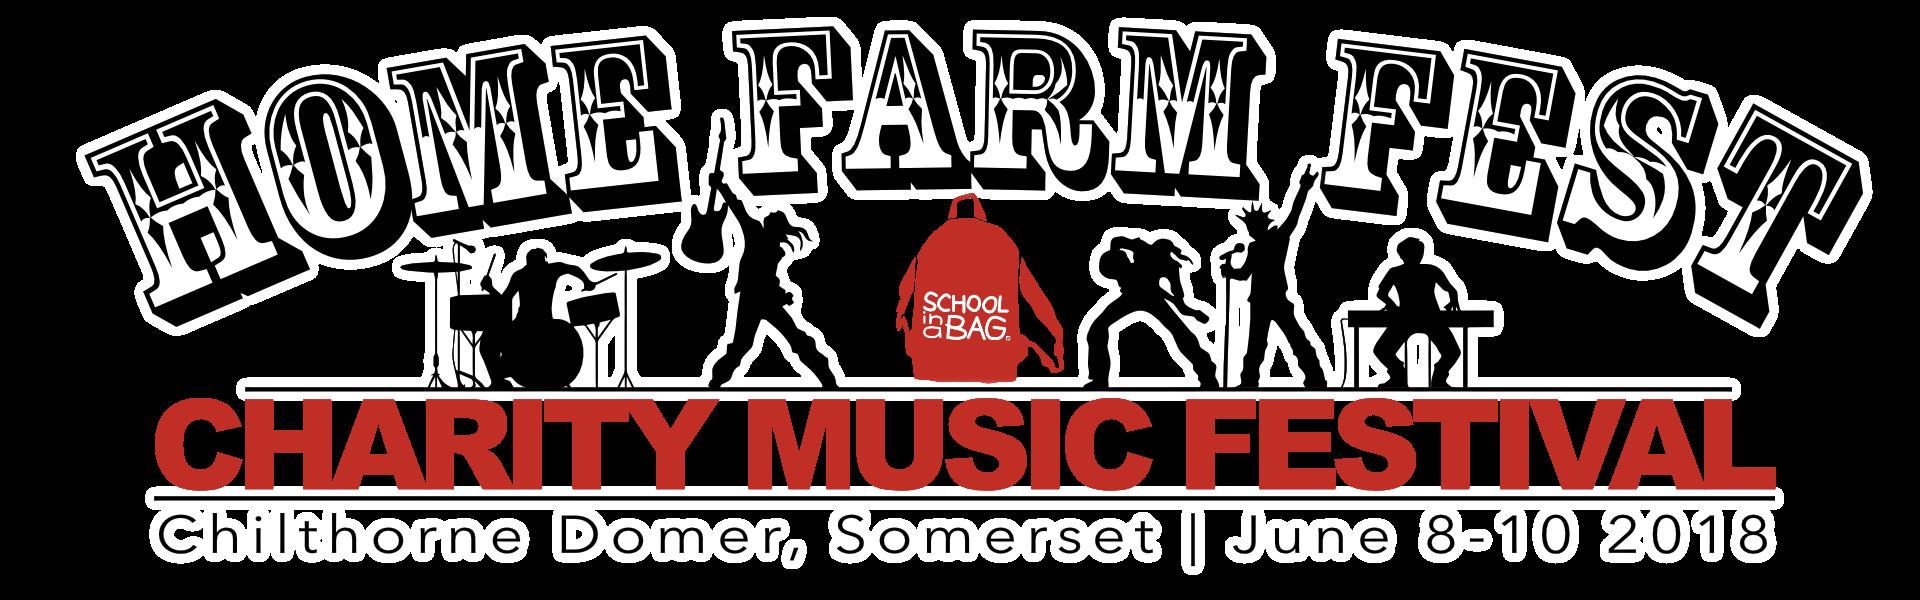 home farm festival school in a bag